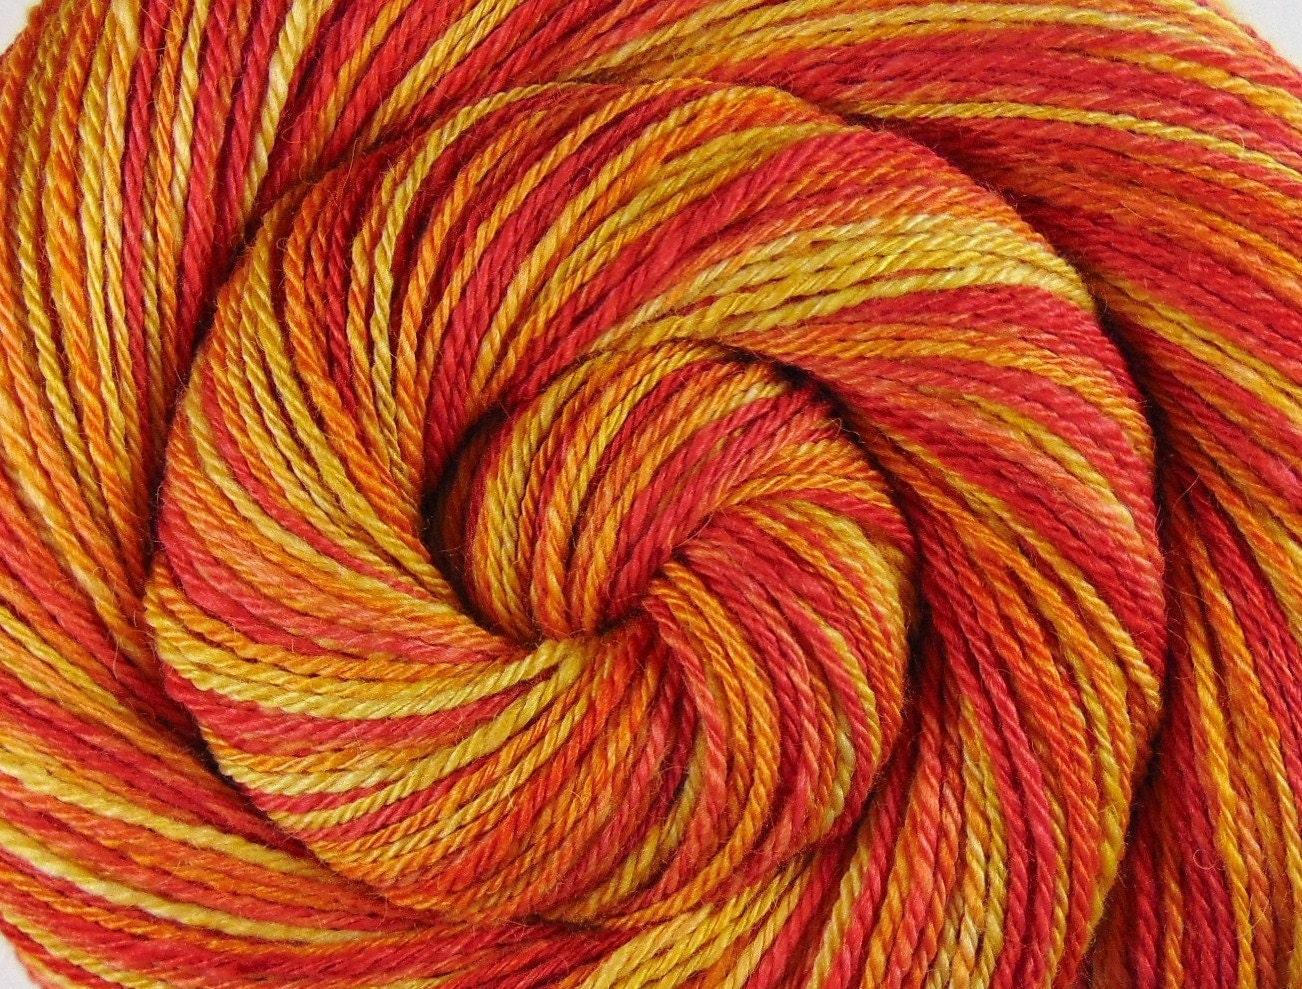 Luxury Yarn : Luxury Handspun Yarn 3 ply THE RISING SUN by BlackSheepGoods